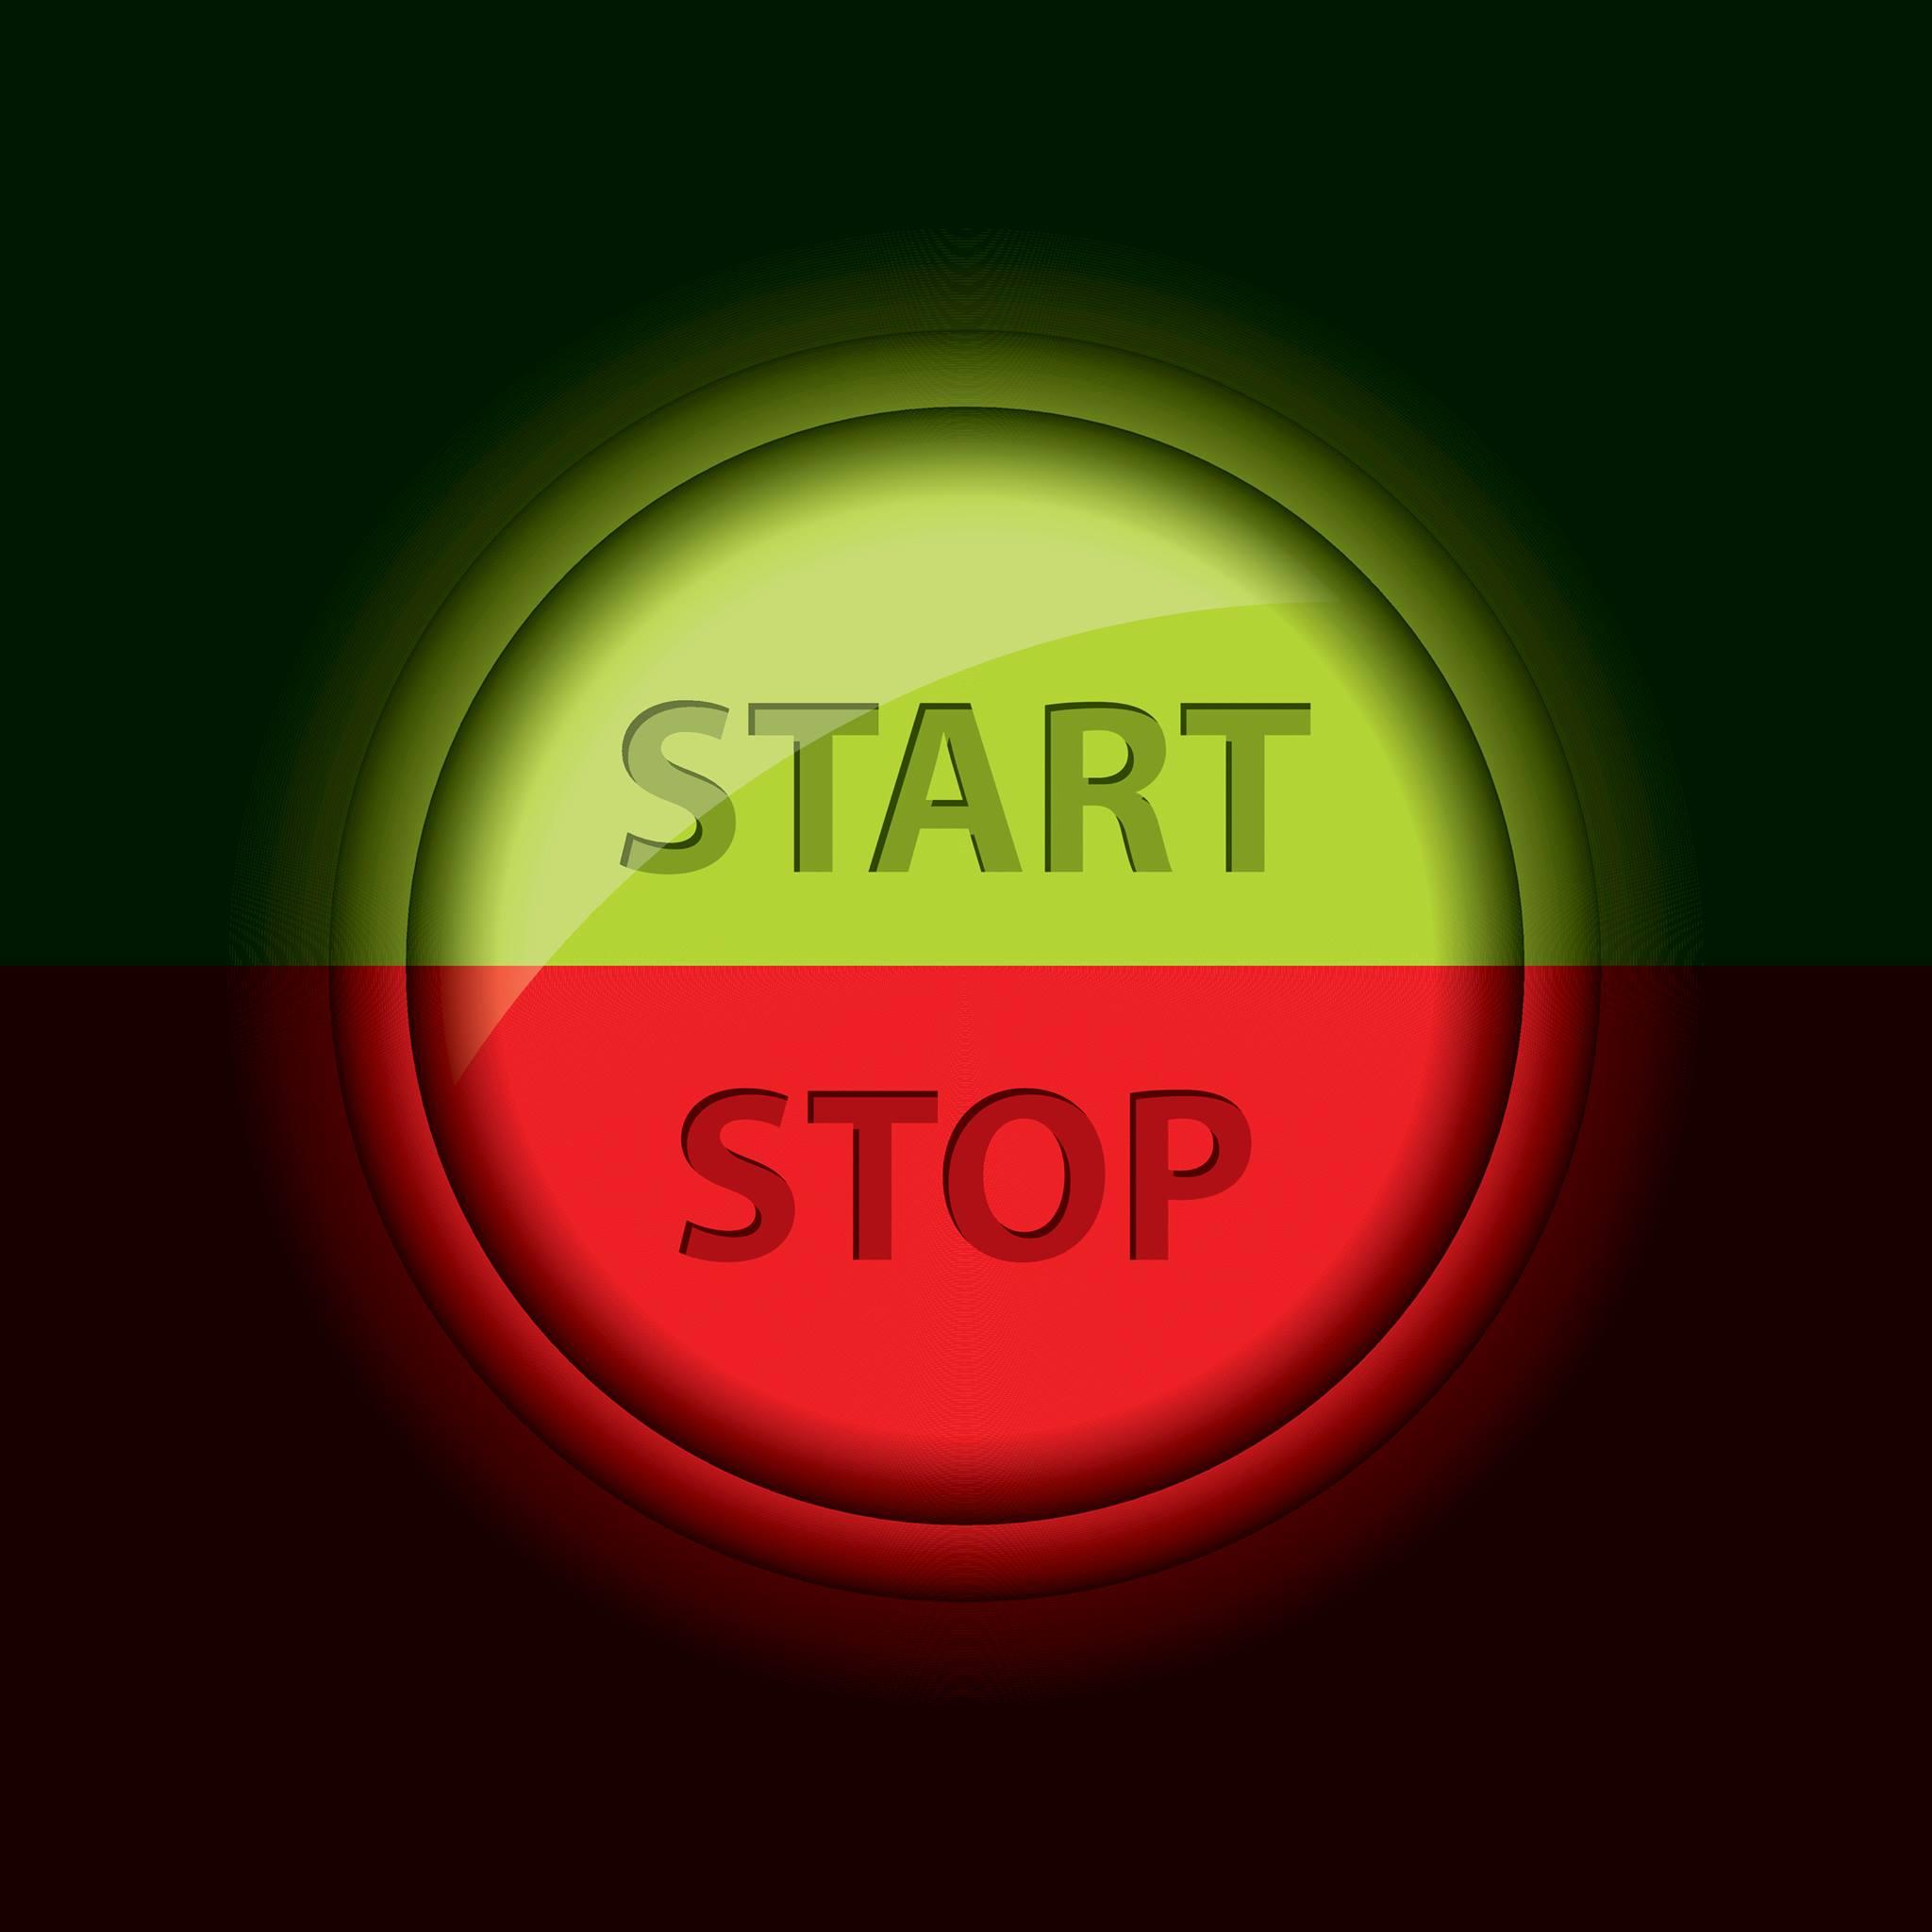 star stop